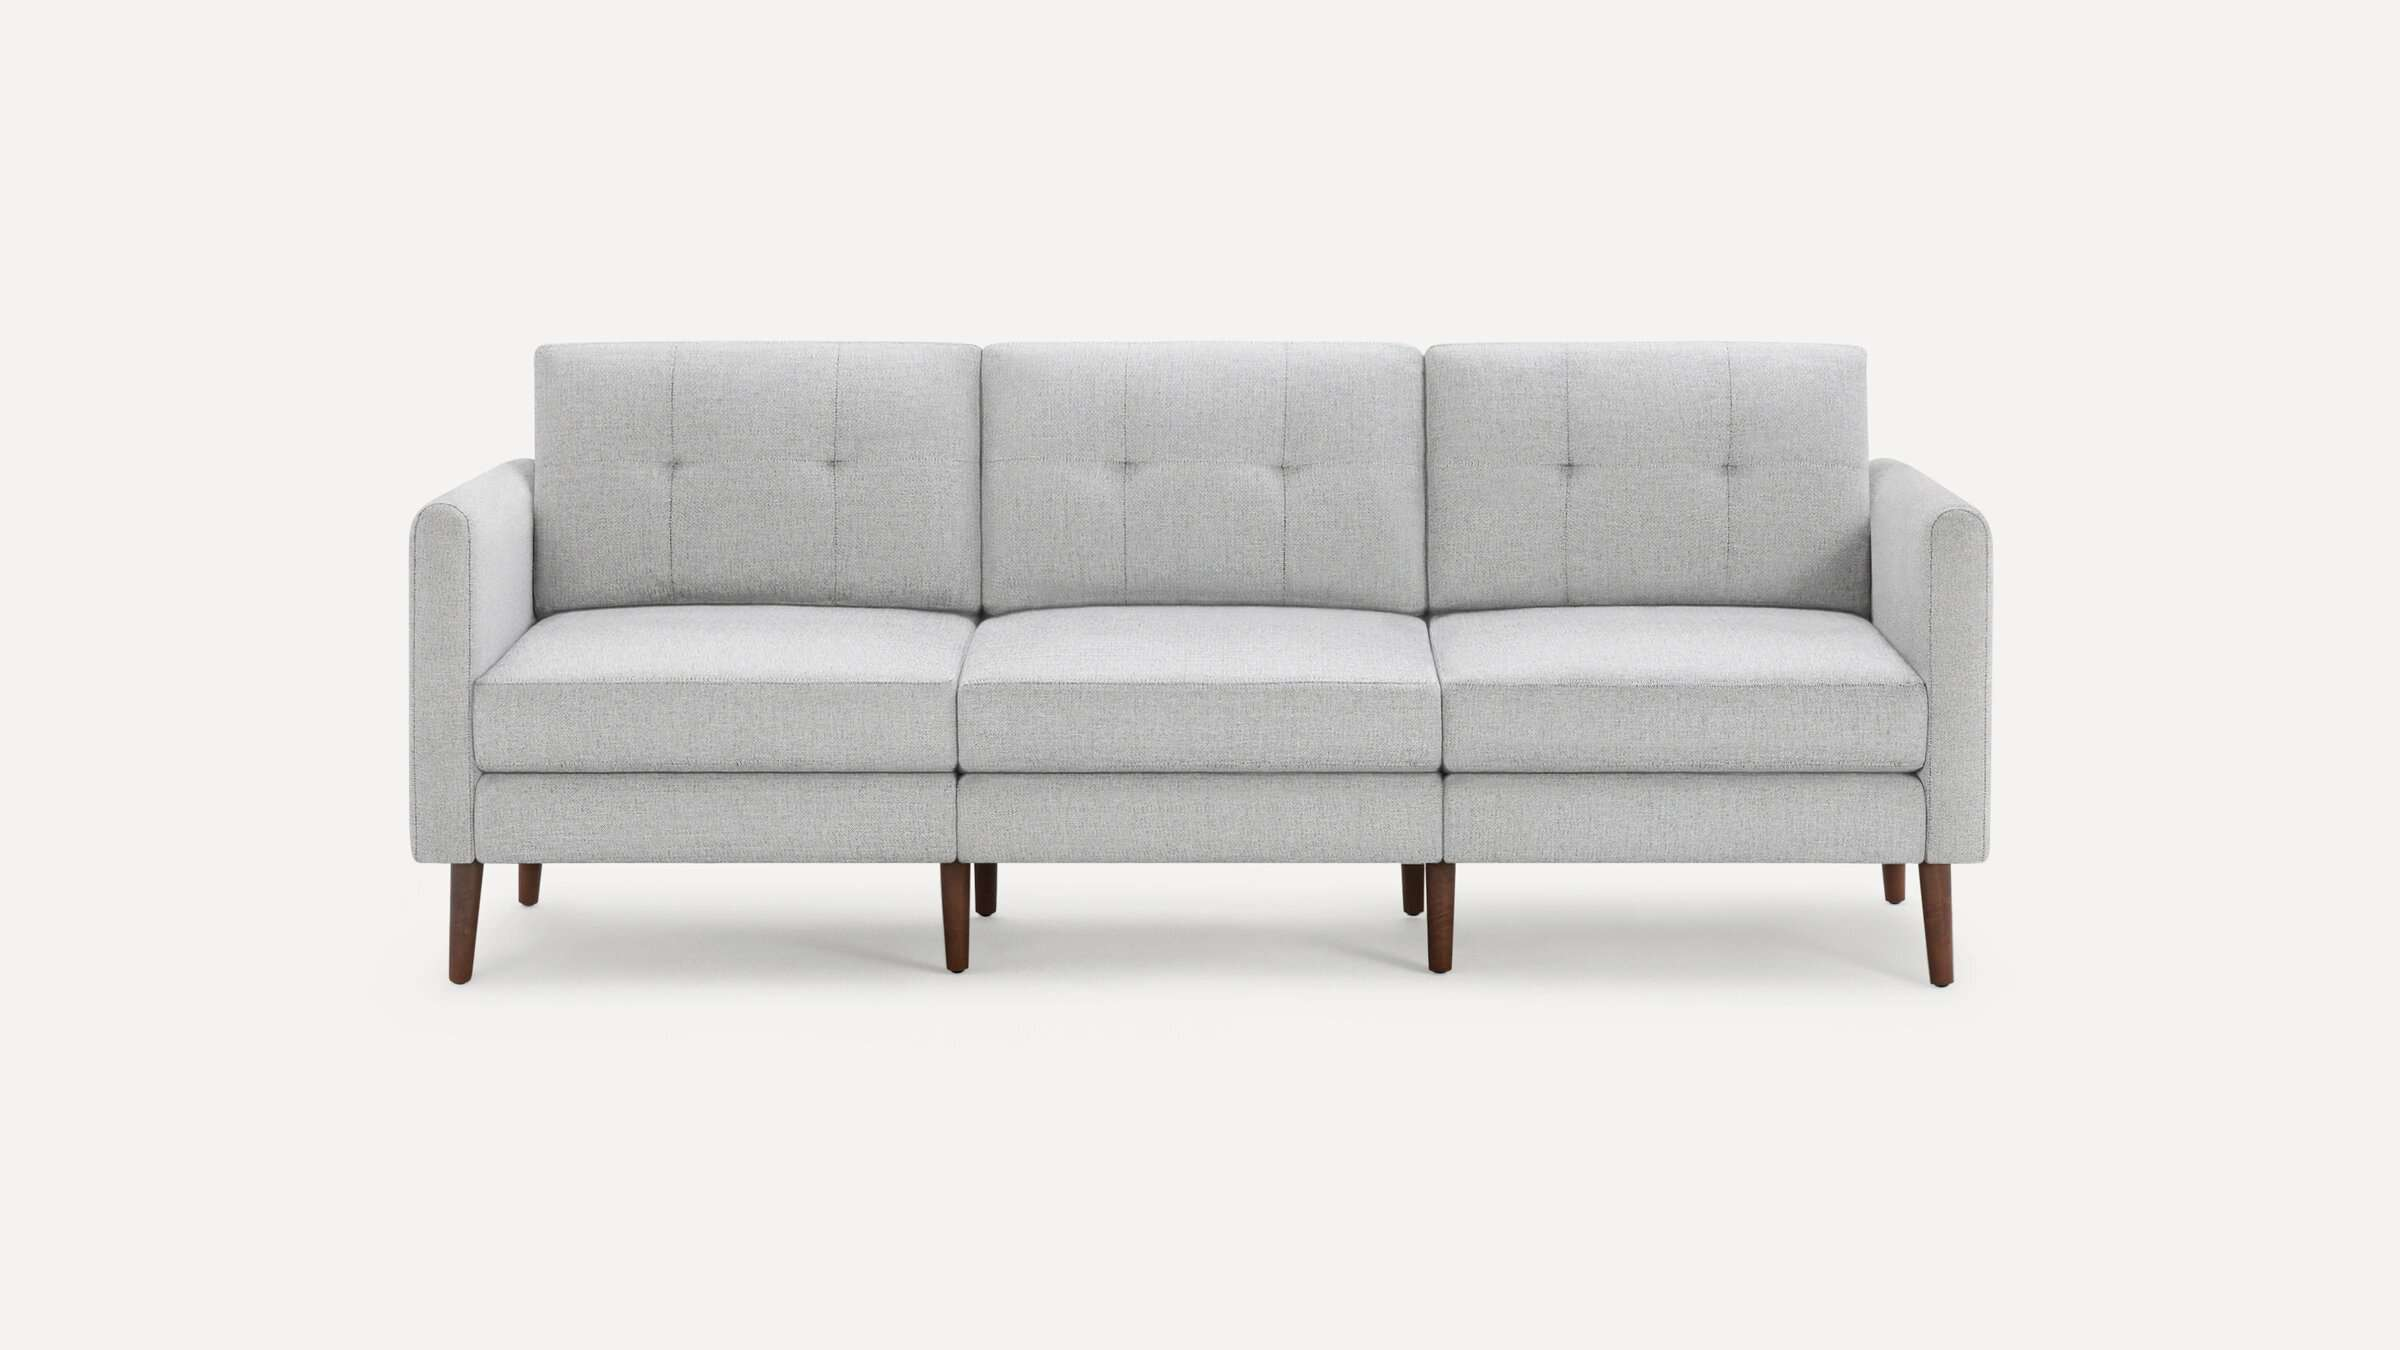 Burrow Arch Nomad Sofa